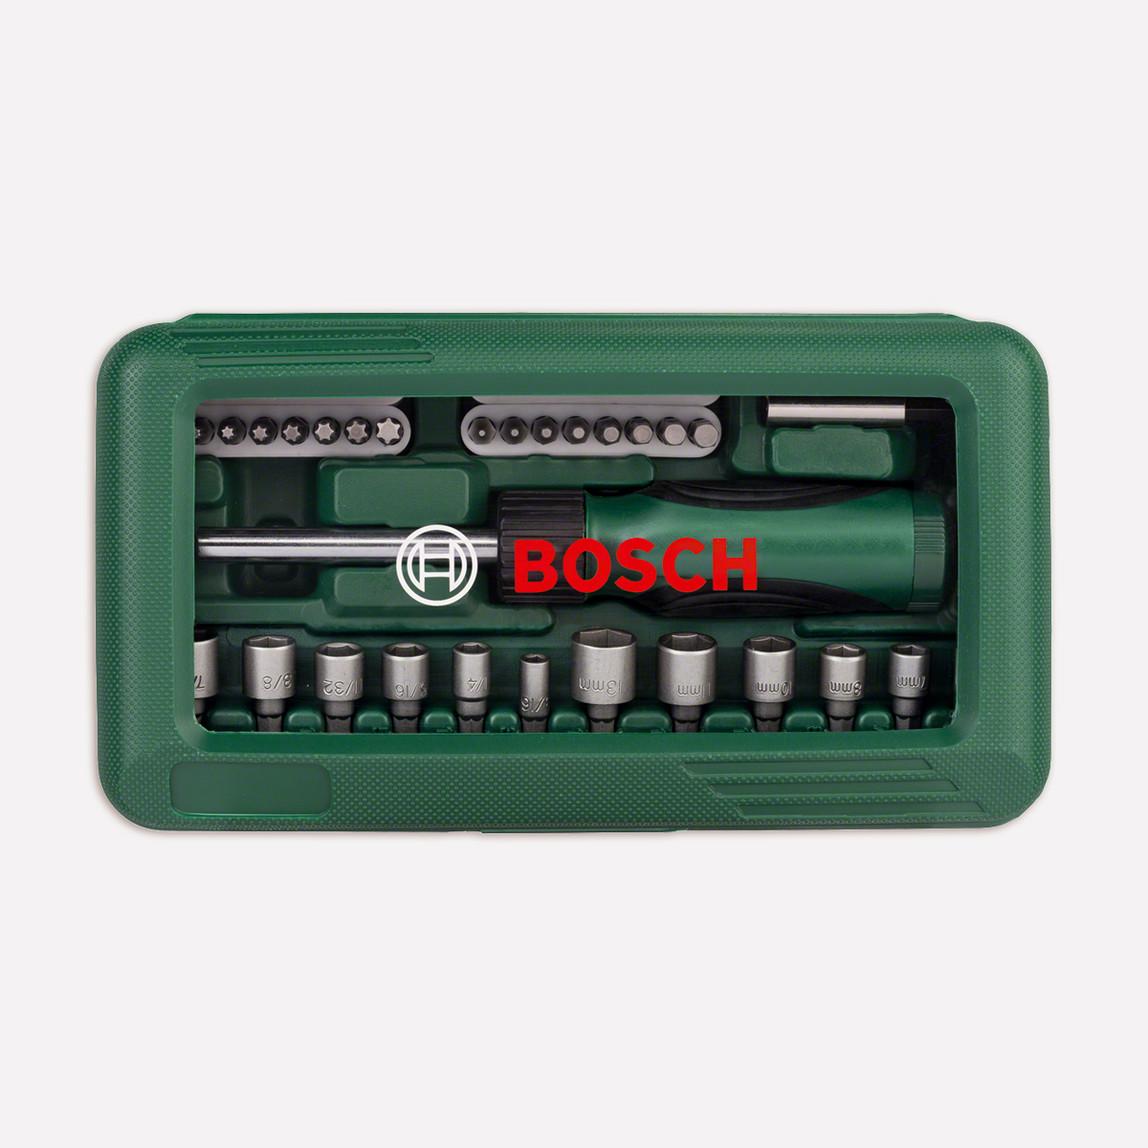 Bosch 46 Parça Cırcırlı Tornavida Seti